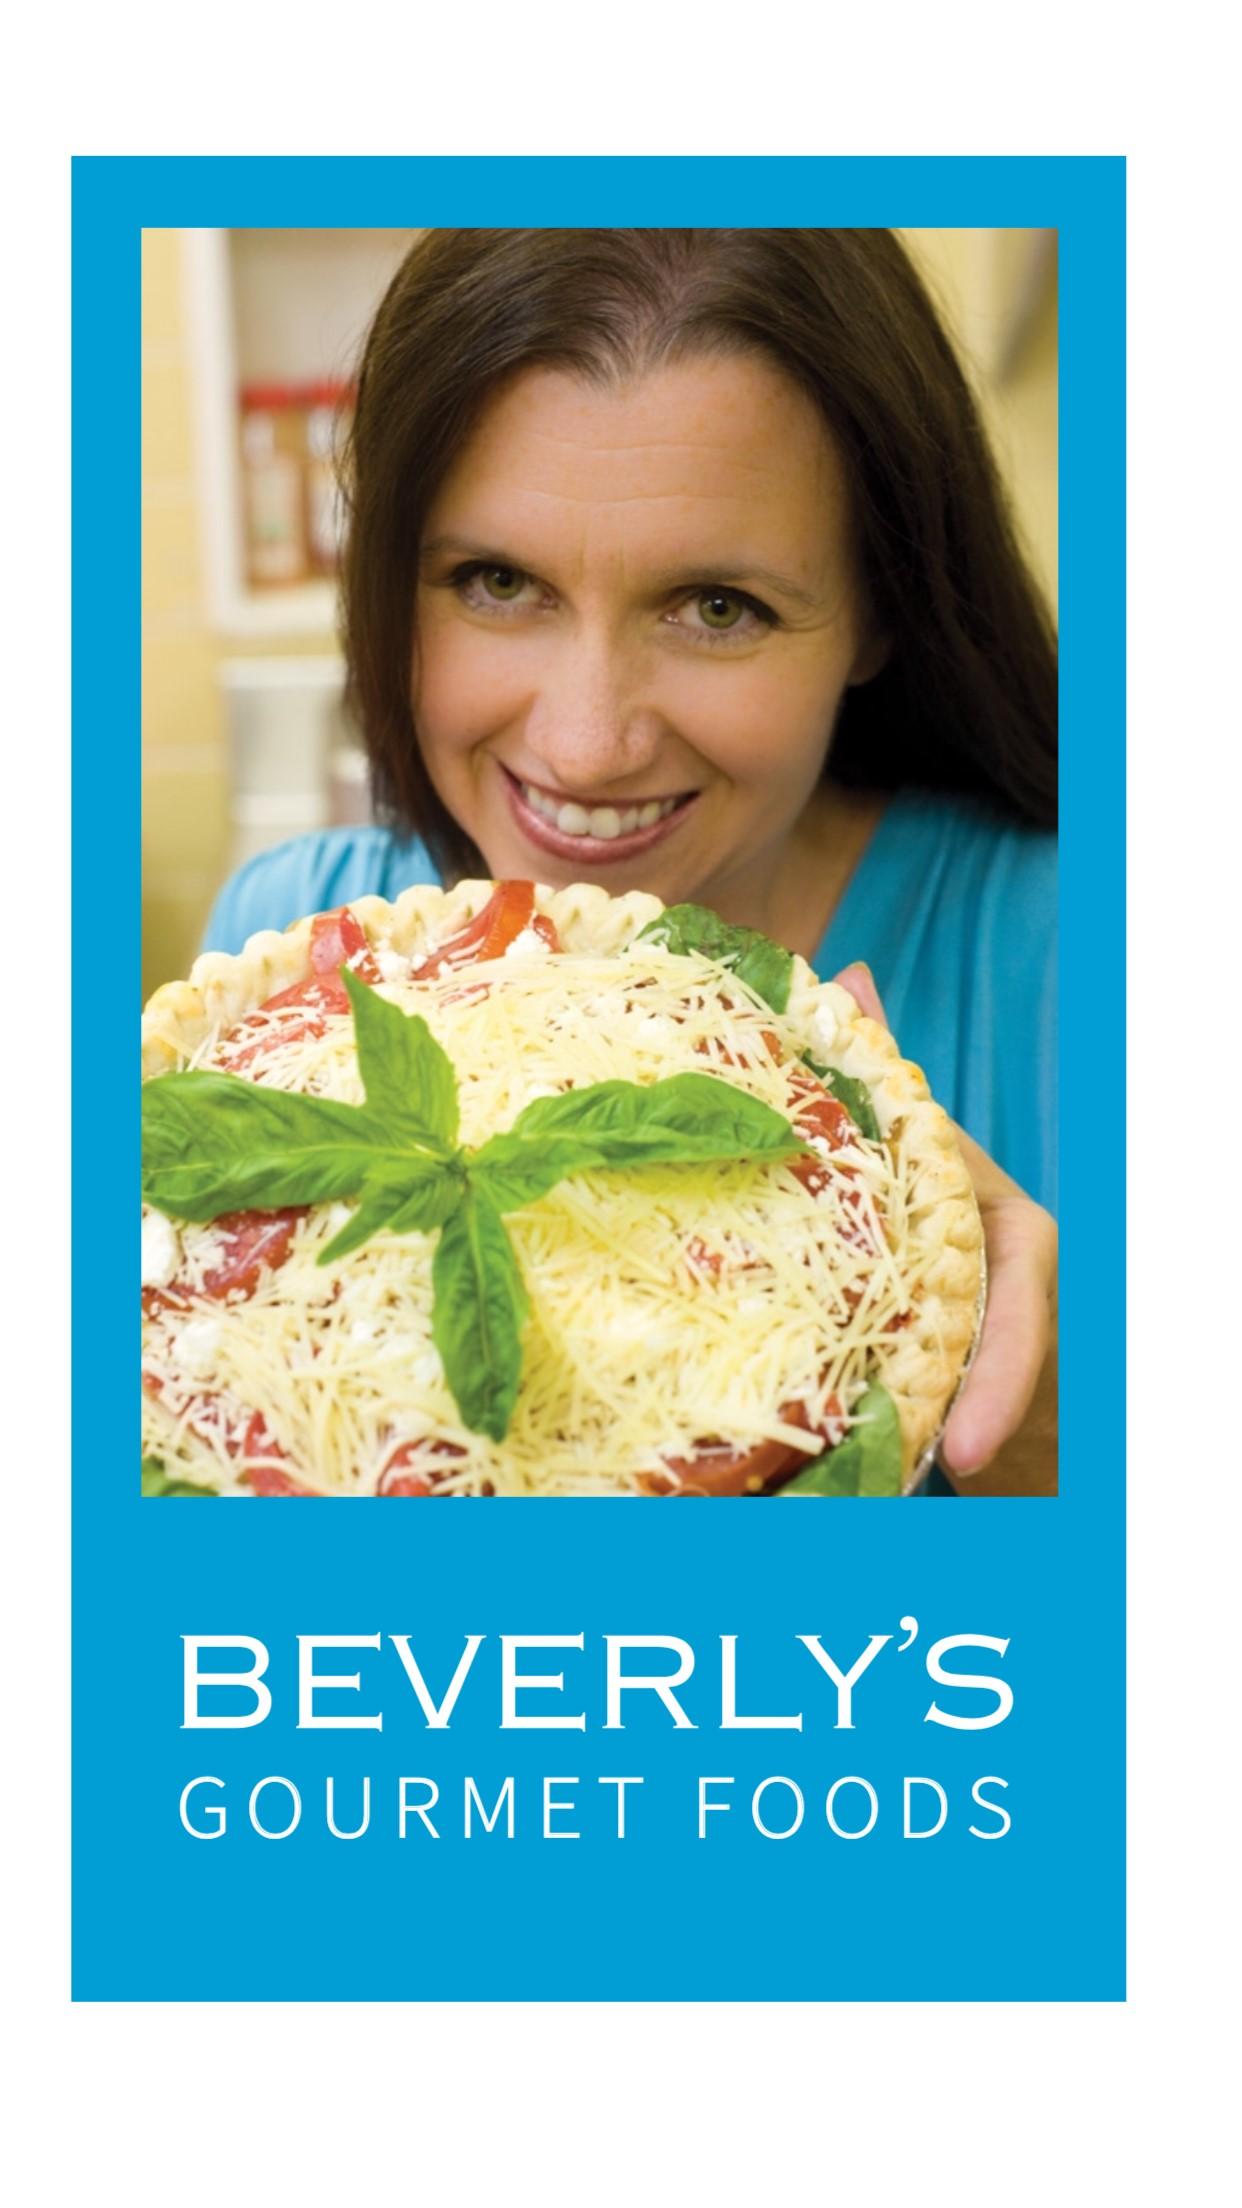 Beverlys Gourmet Foods Inc